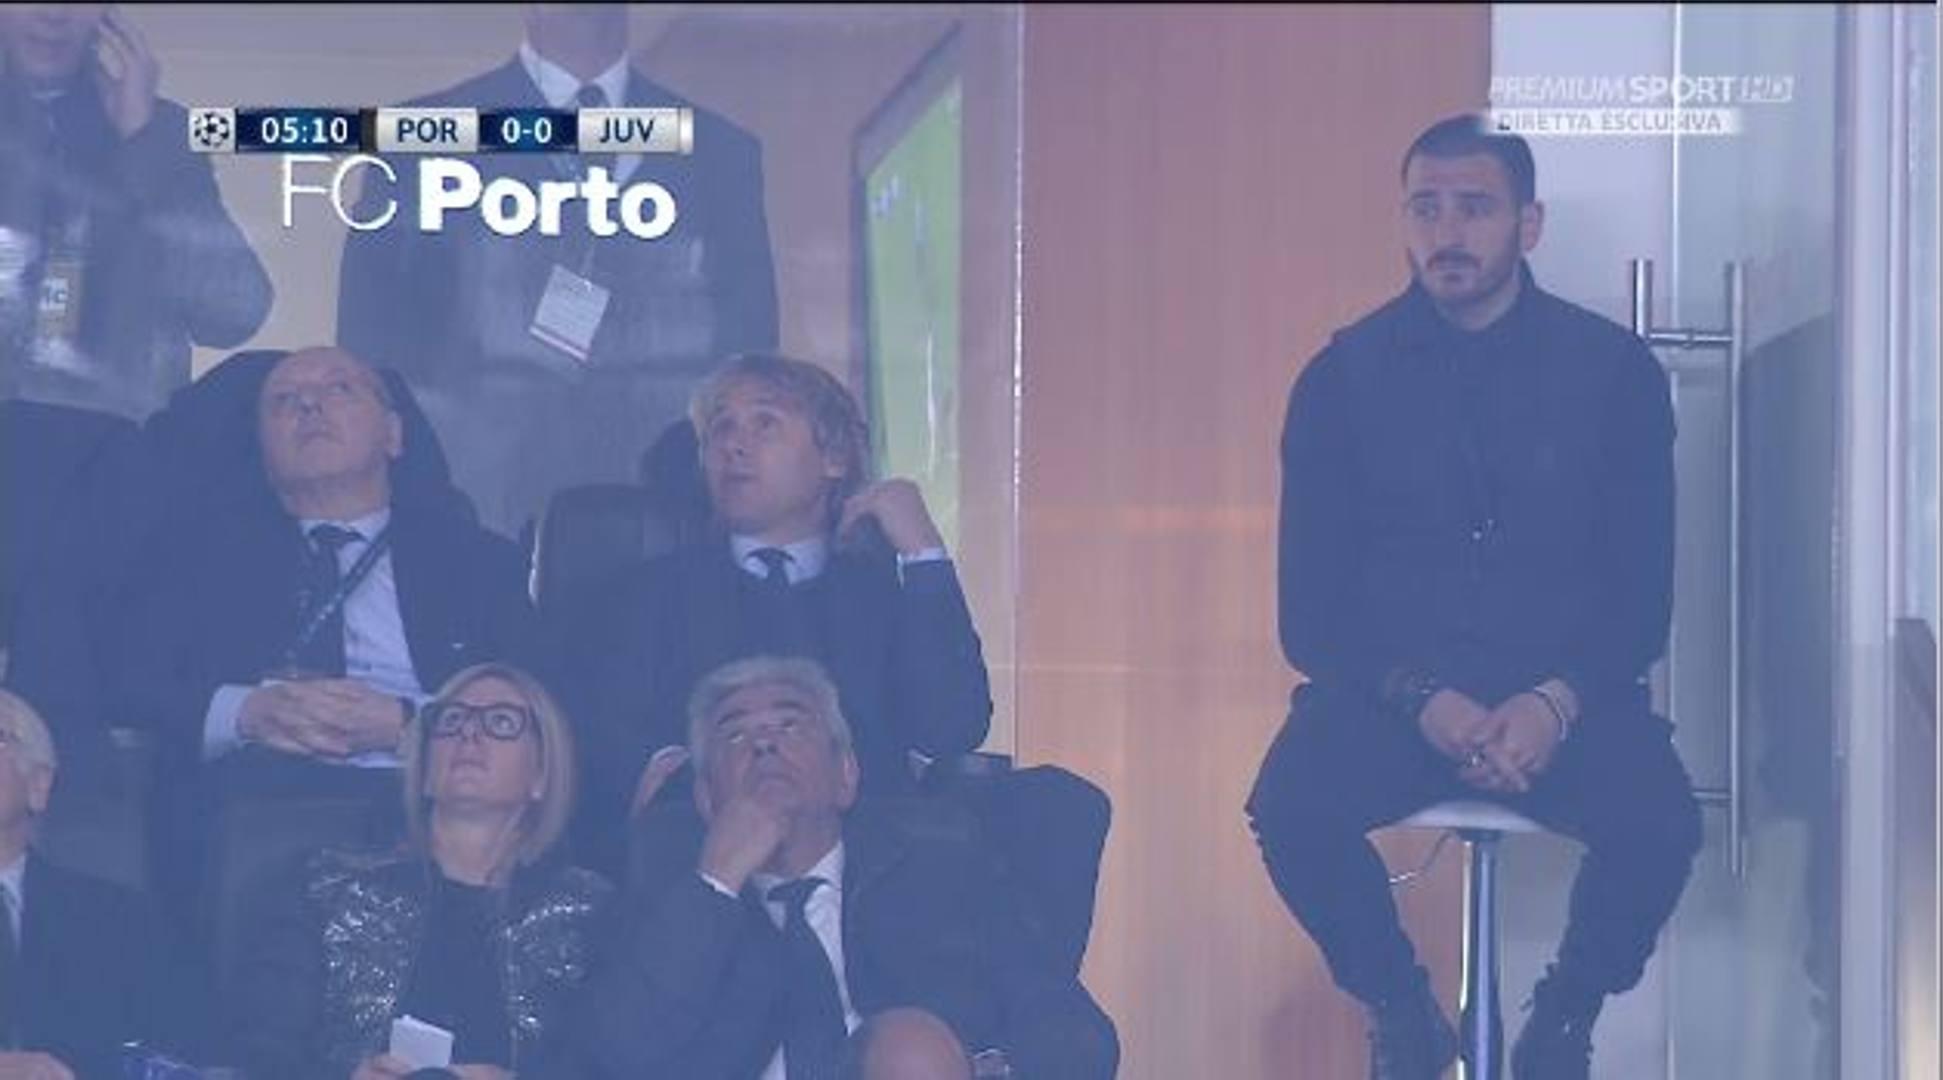 Milan swiftly assembling  a recognizable team  - Page 8 Bonucci_tribuna_mediagallery-fullscreen